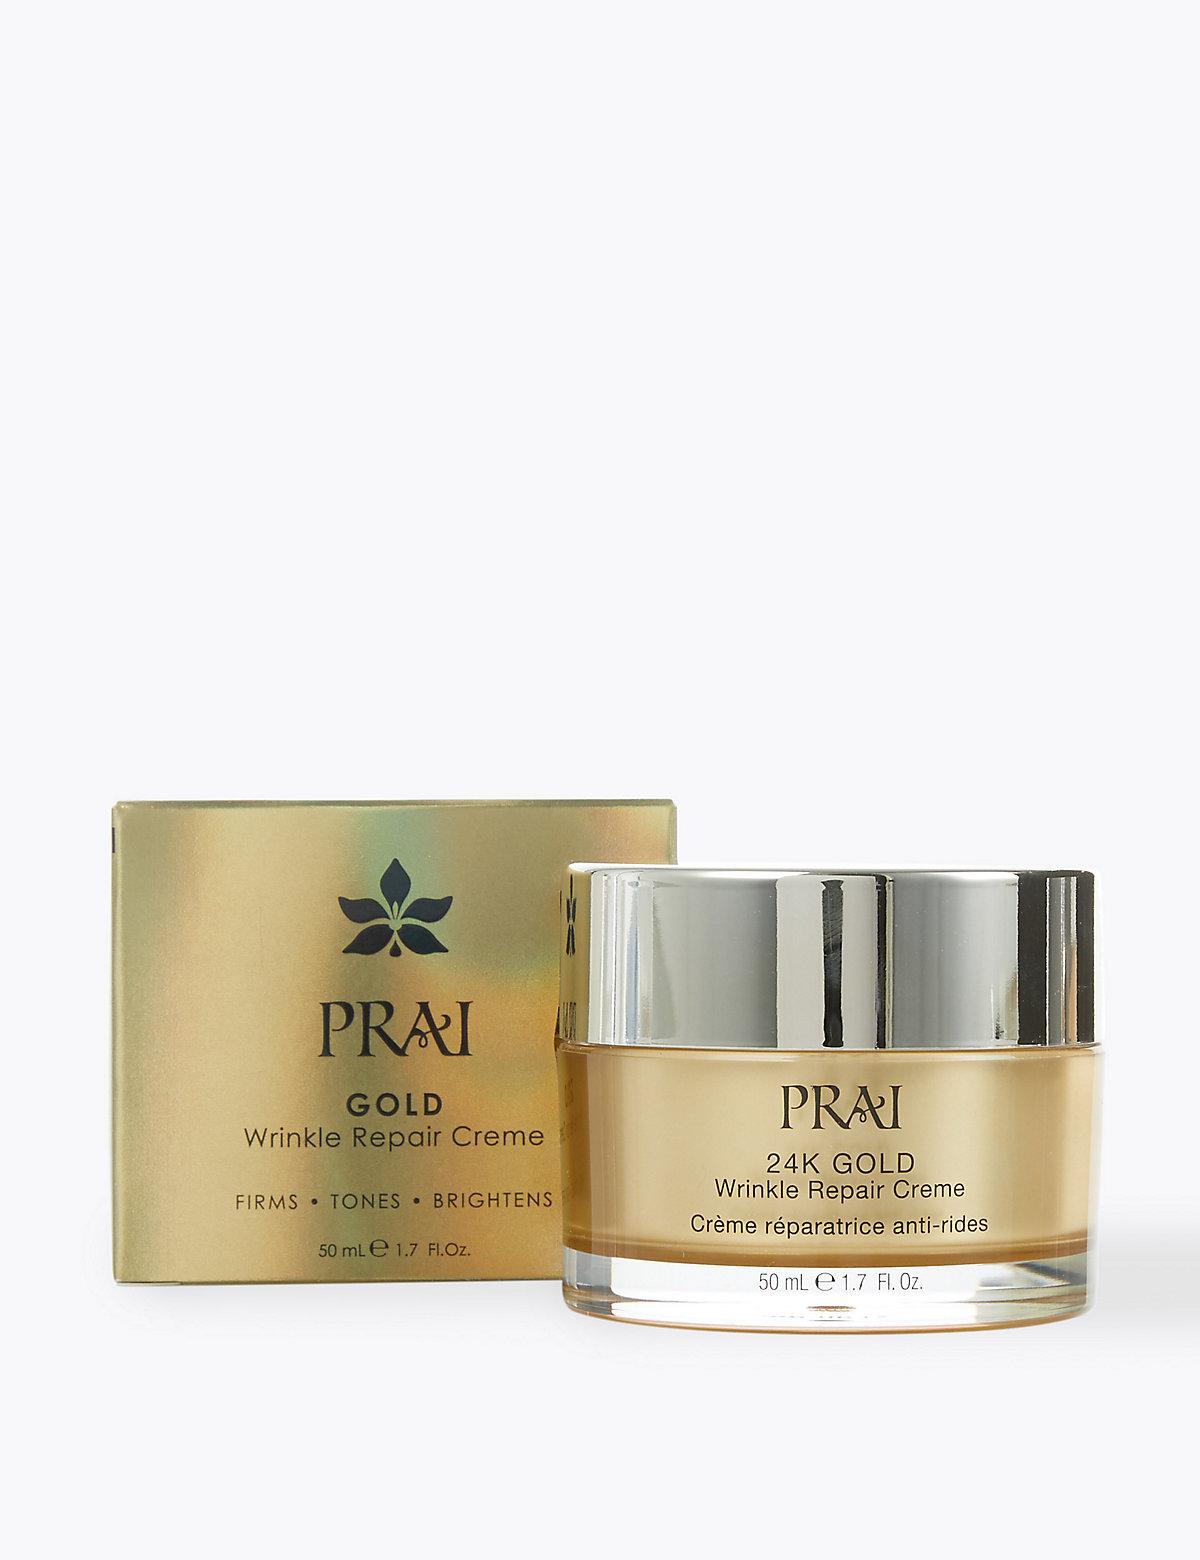 PRAI 24k Wrinkle Repair Crème 50ml